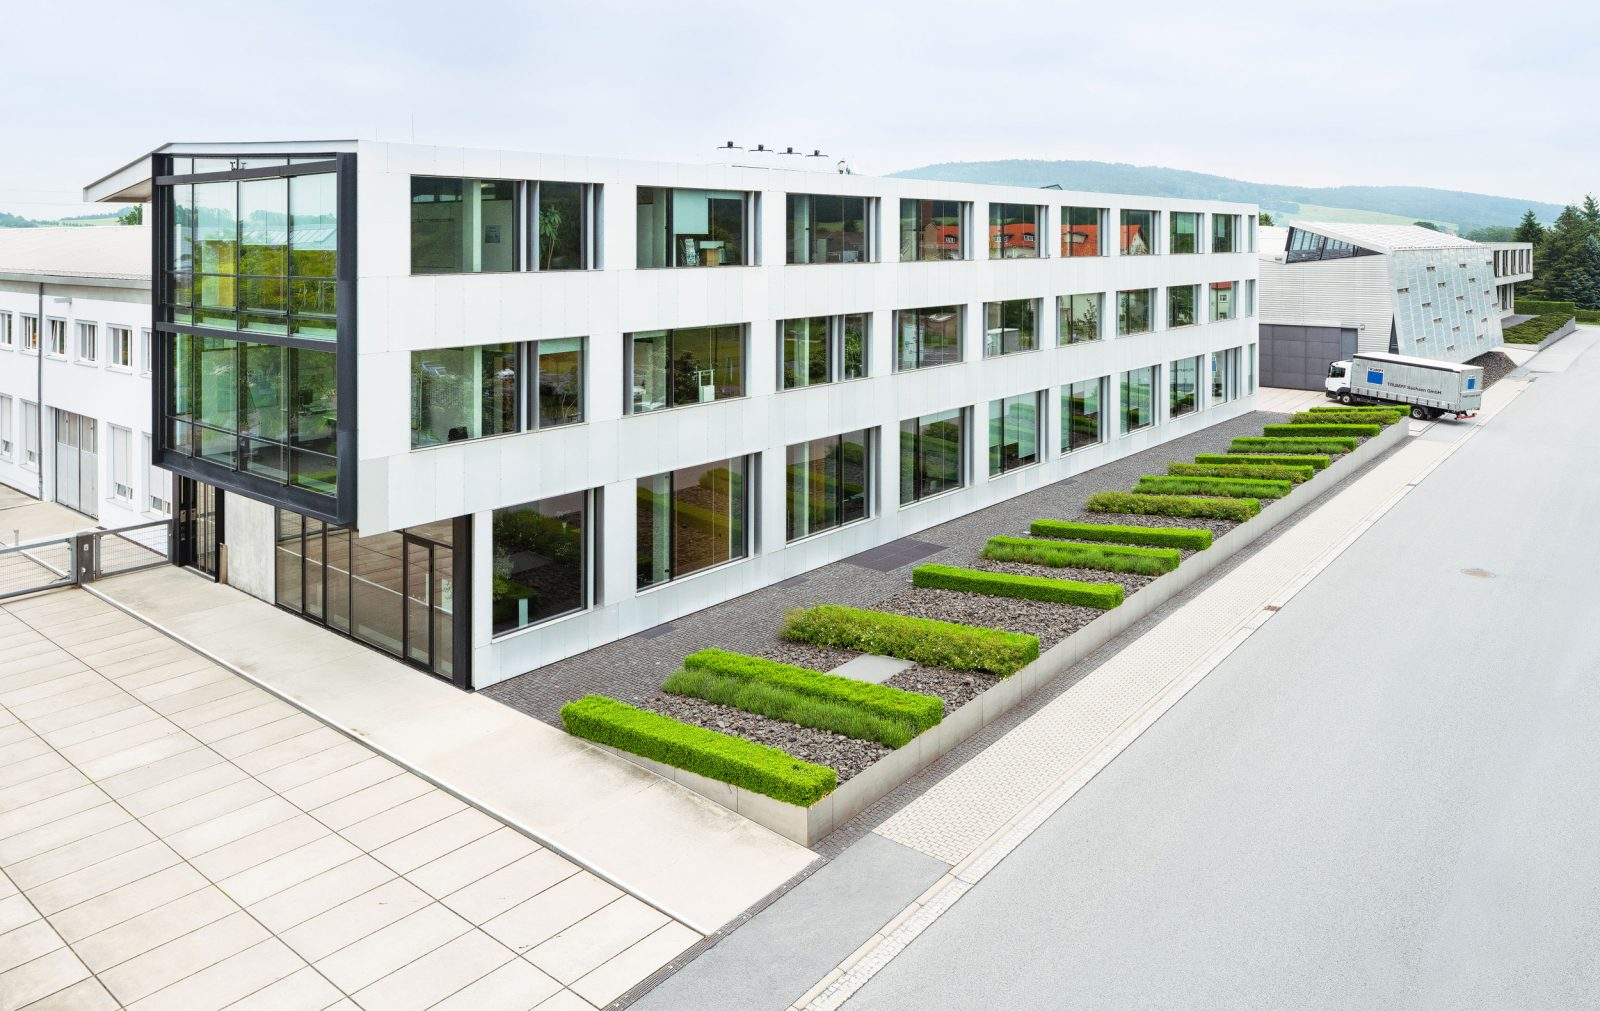 Bürogebäude Trumpf Sachsen GmbH, Neukirch/Lausitz